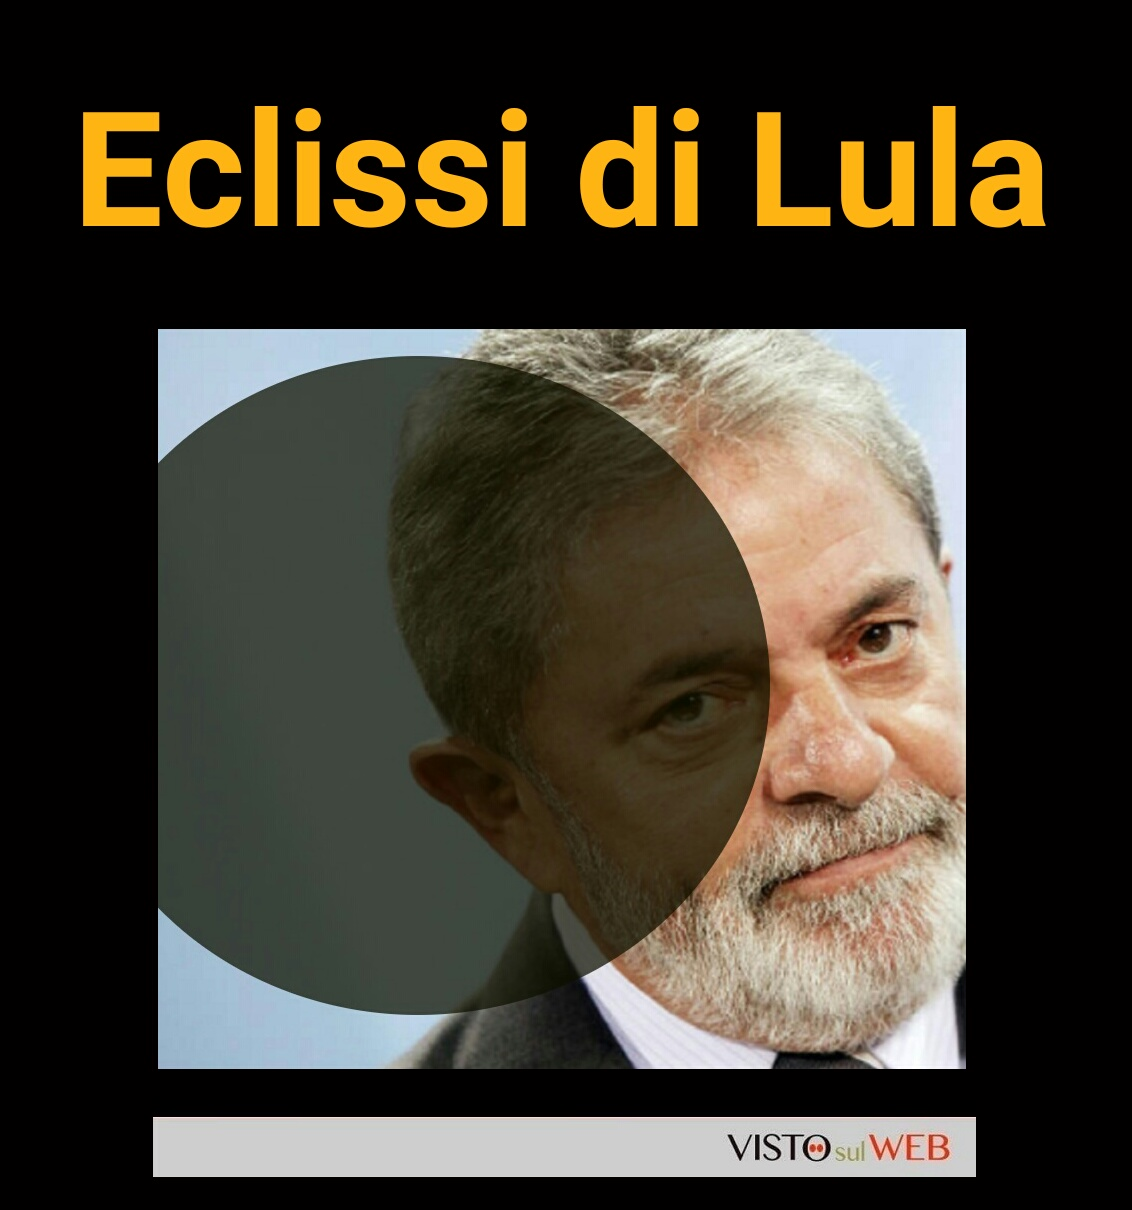 Eclissi di Lula